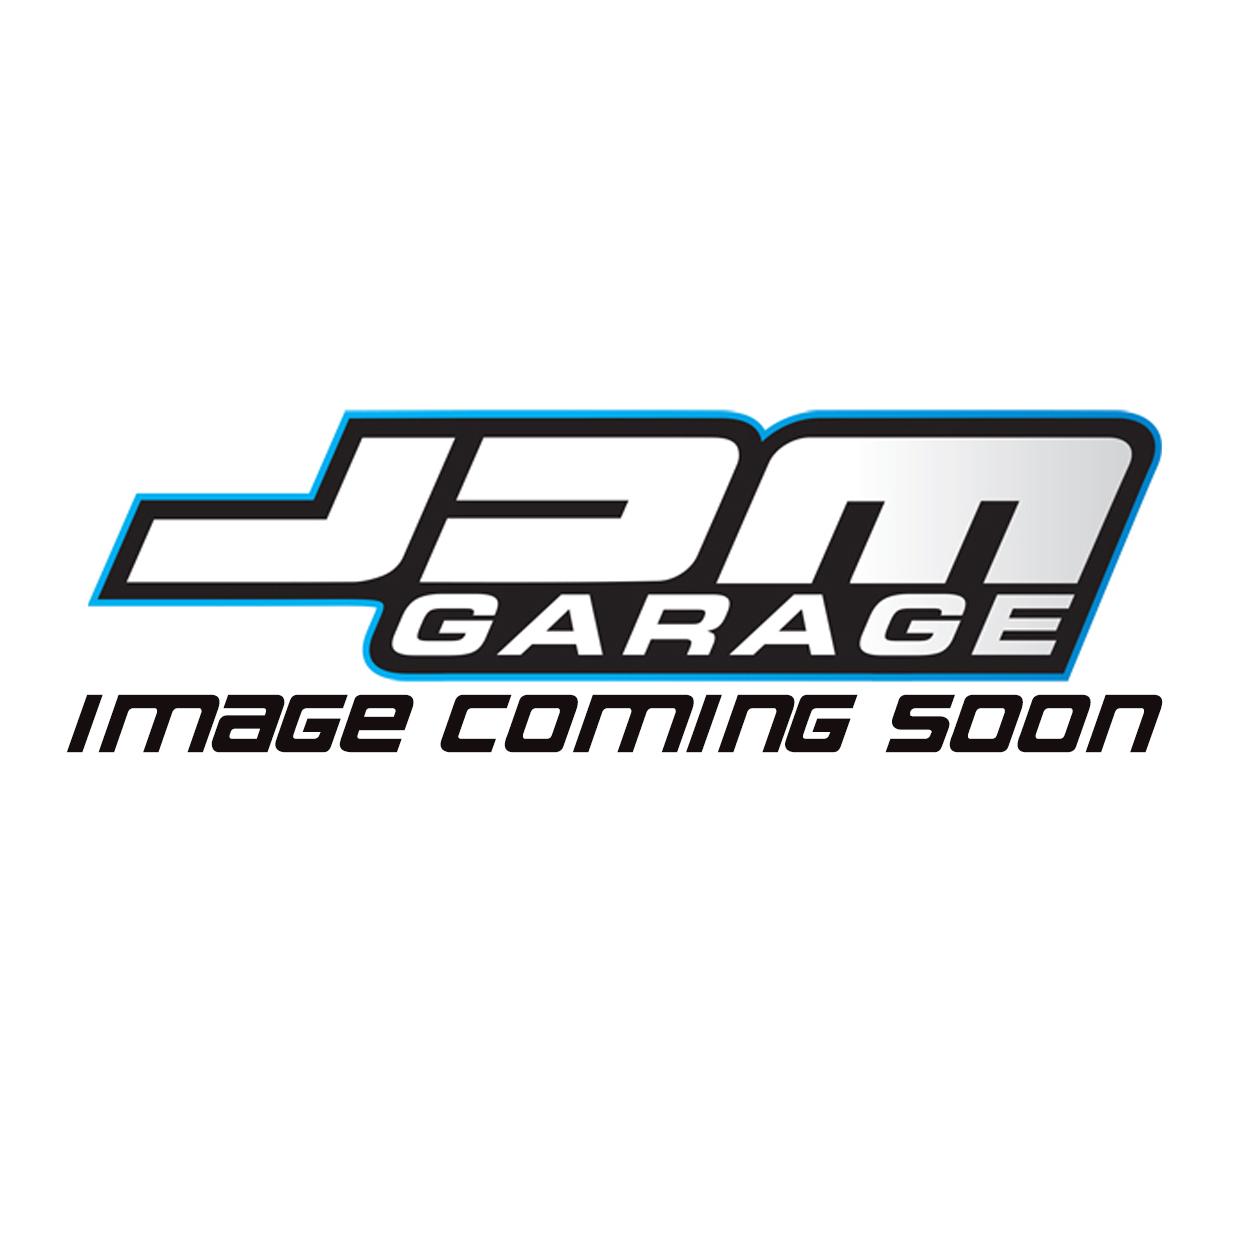 R33 'SKYLINE' Rear LED Panel